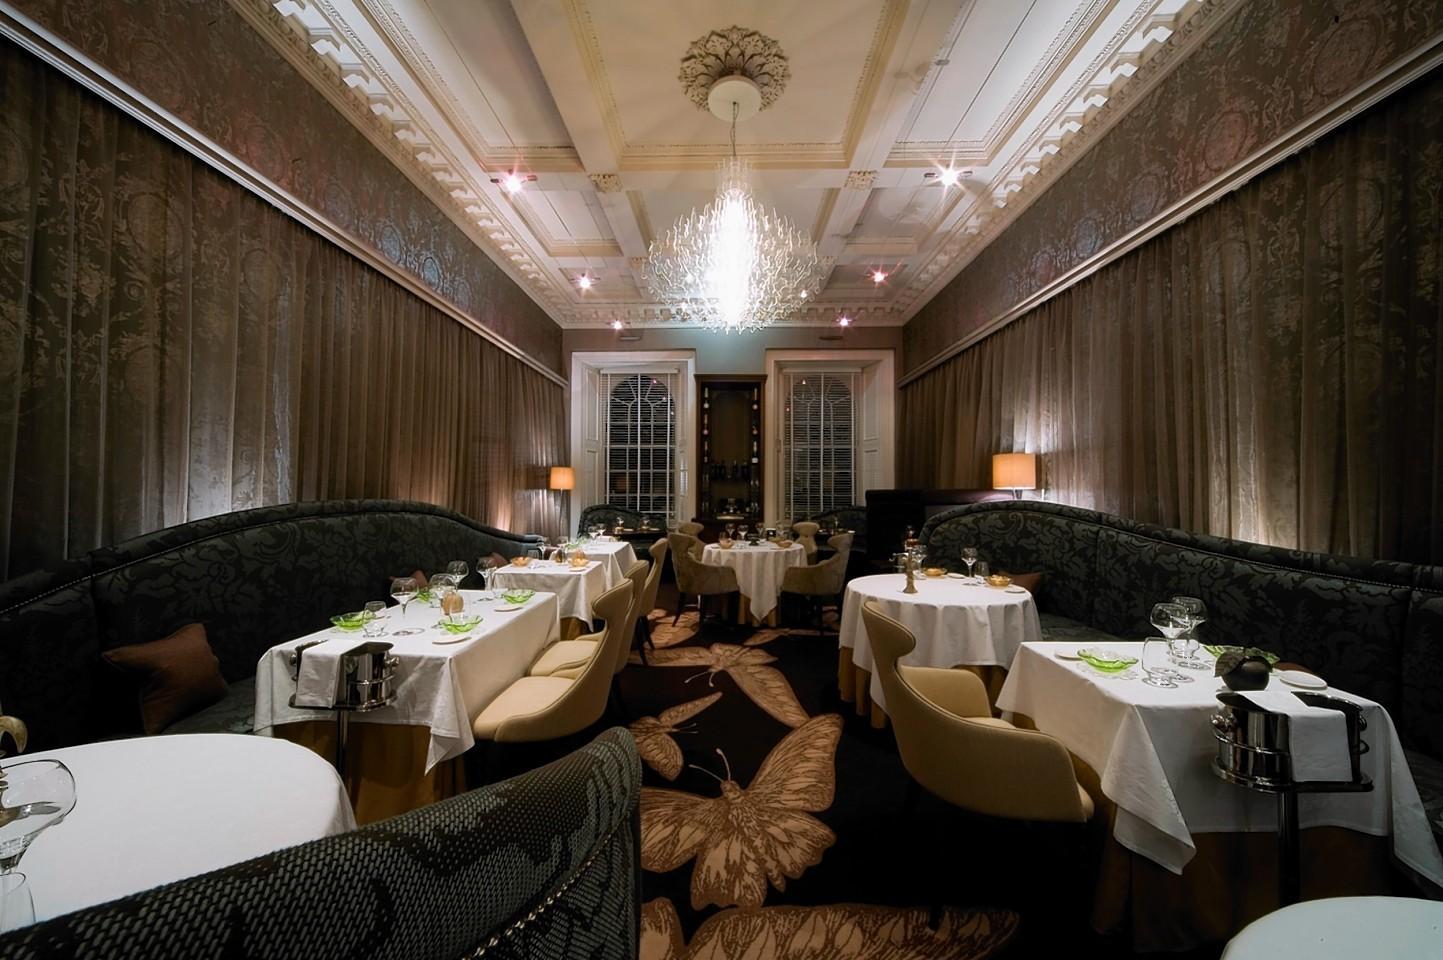 The stunning 21212 restaurant, in the heart of Edinburgh